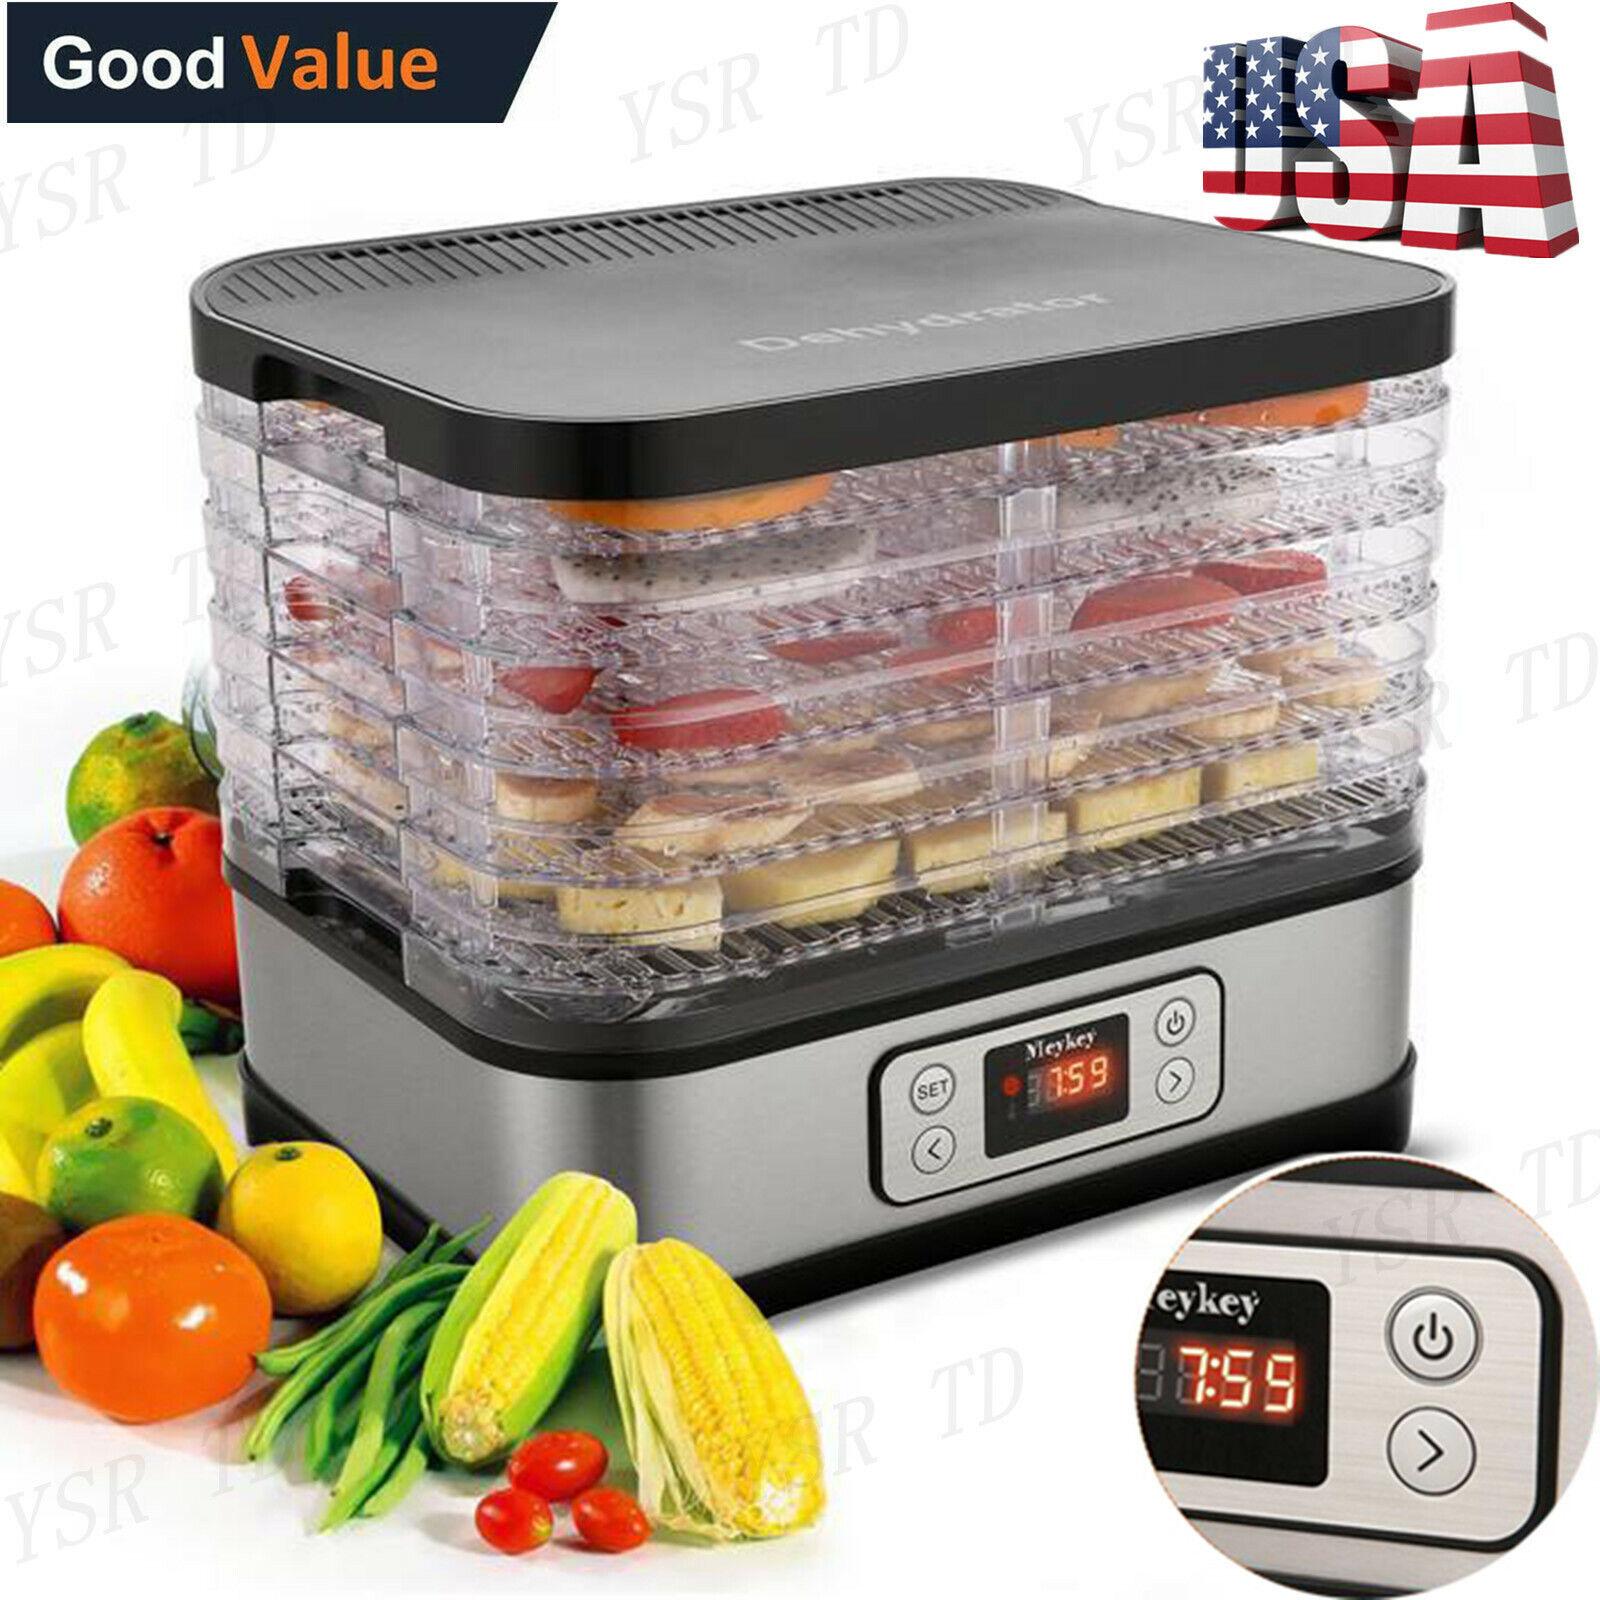 5 8 tier electric food dehydrator fruit